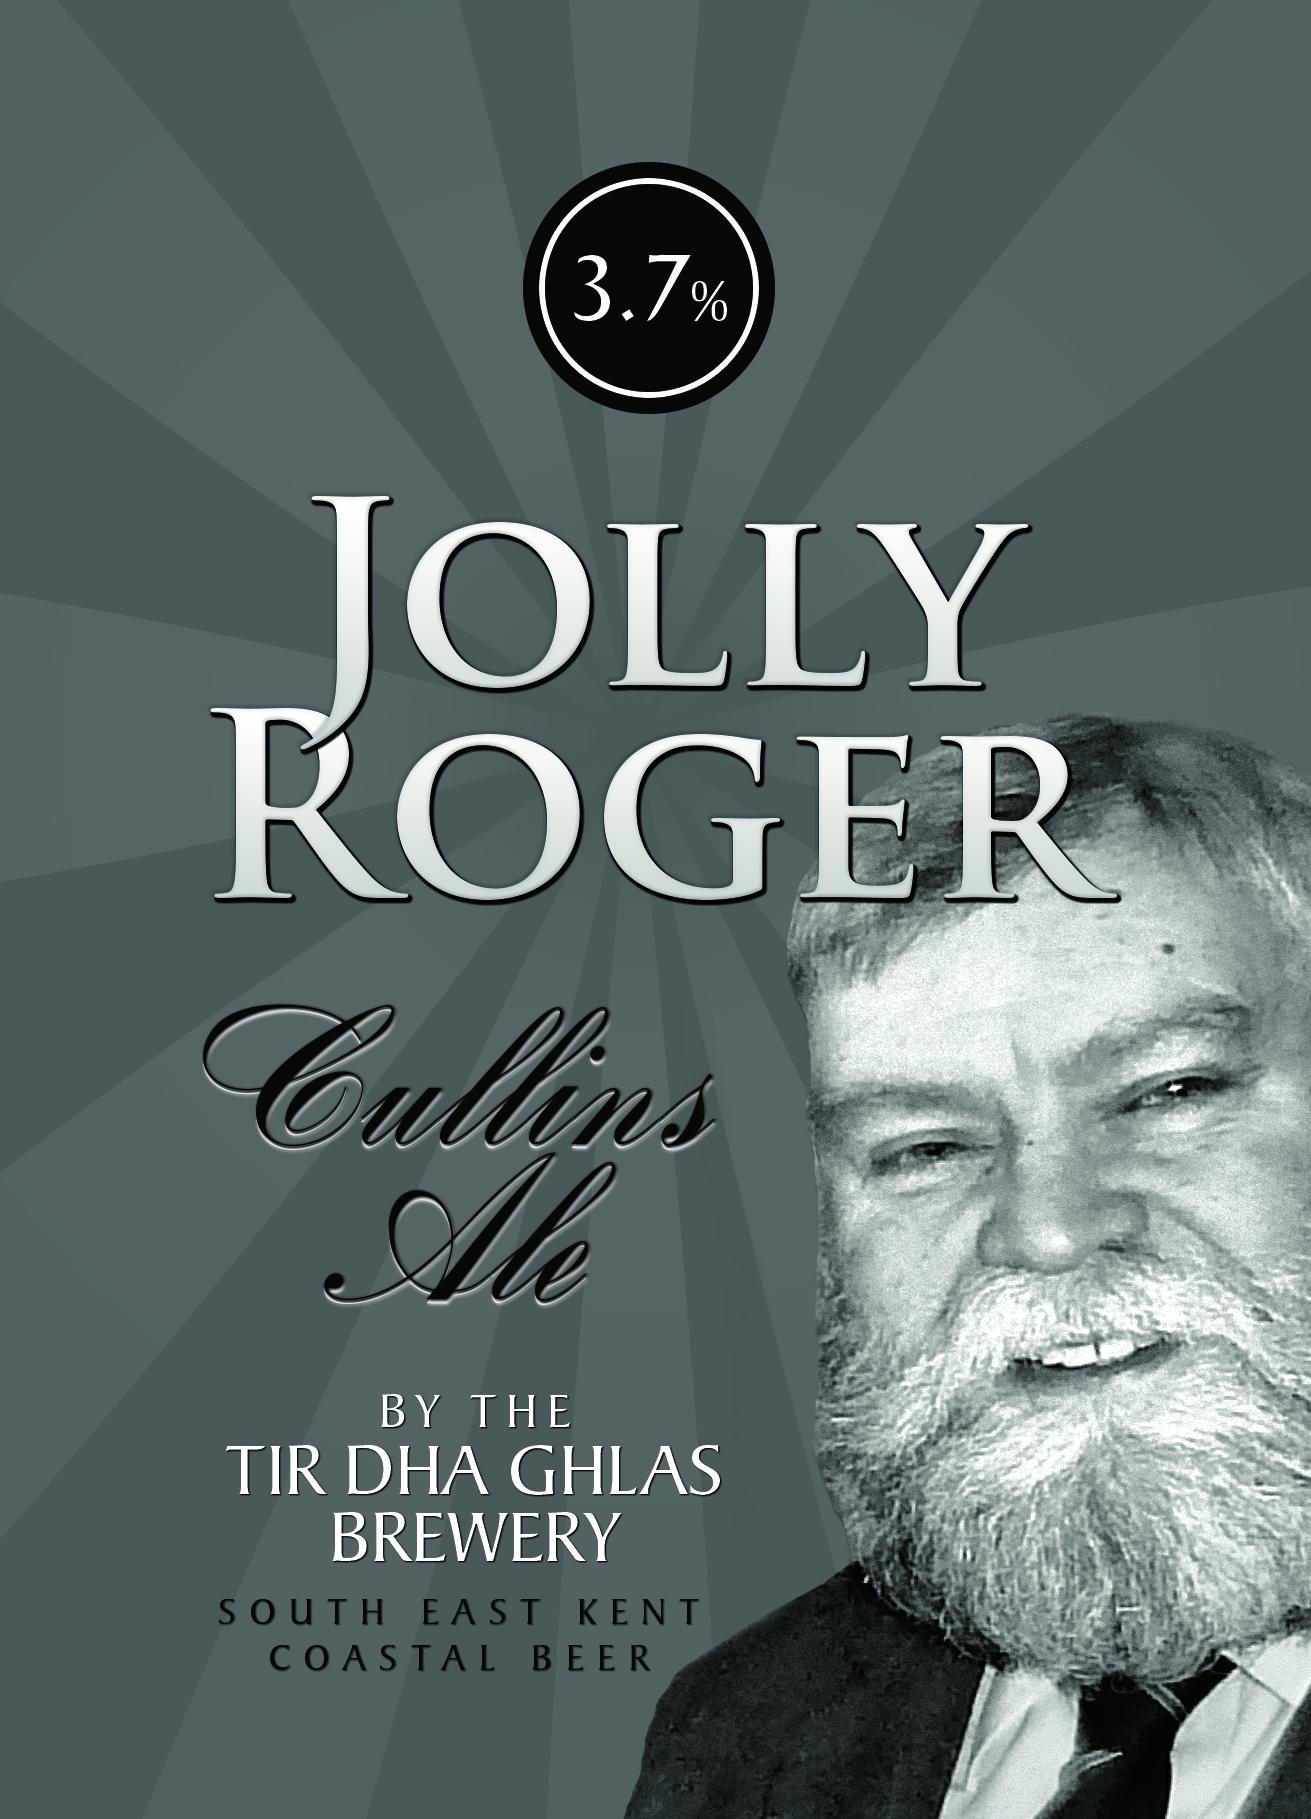 c beer clip A6 jolly